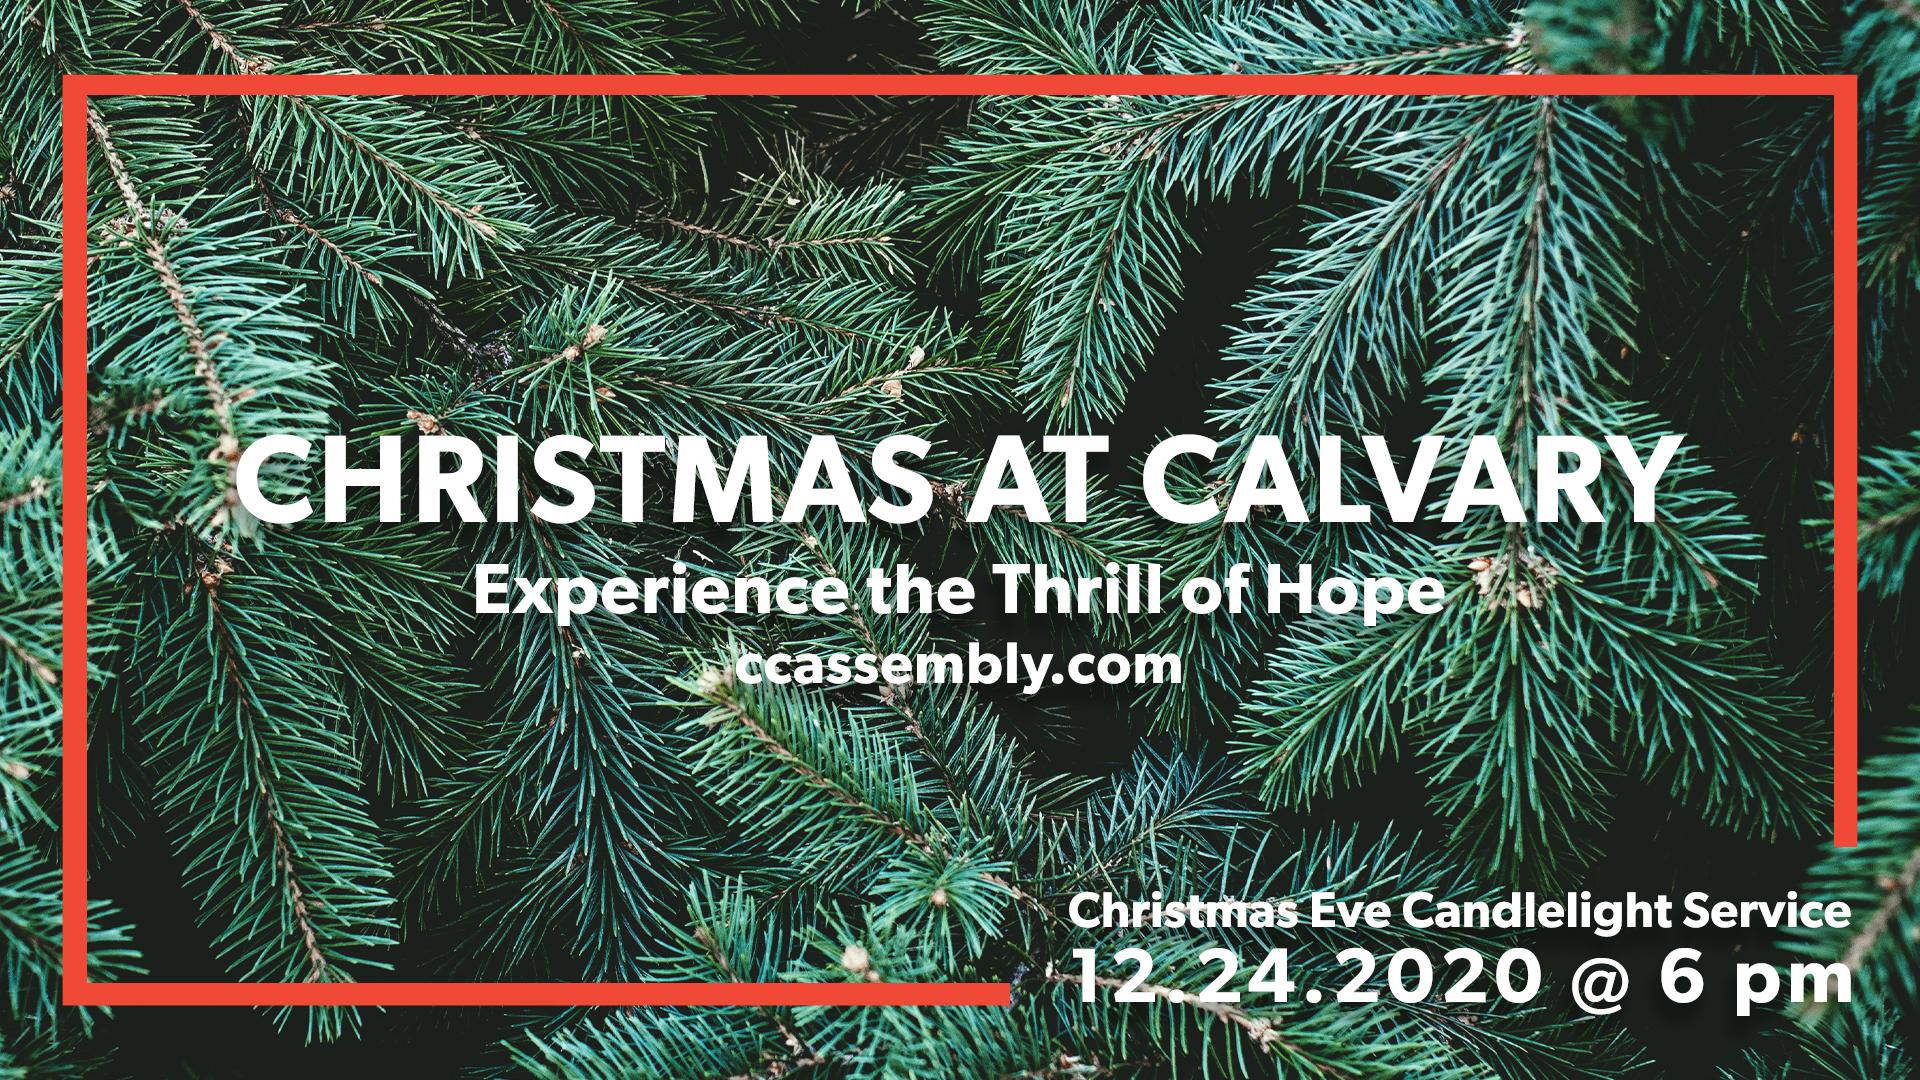 Christmas At Calvary: His Name Shall Be Callled Prince of Peace